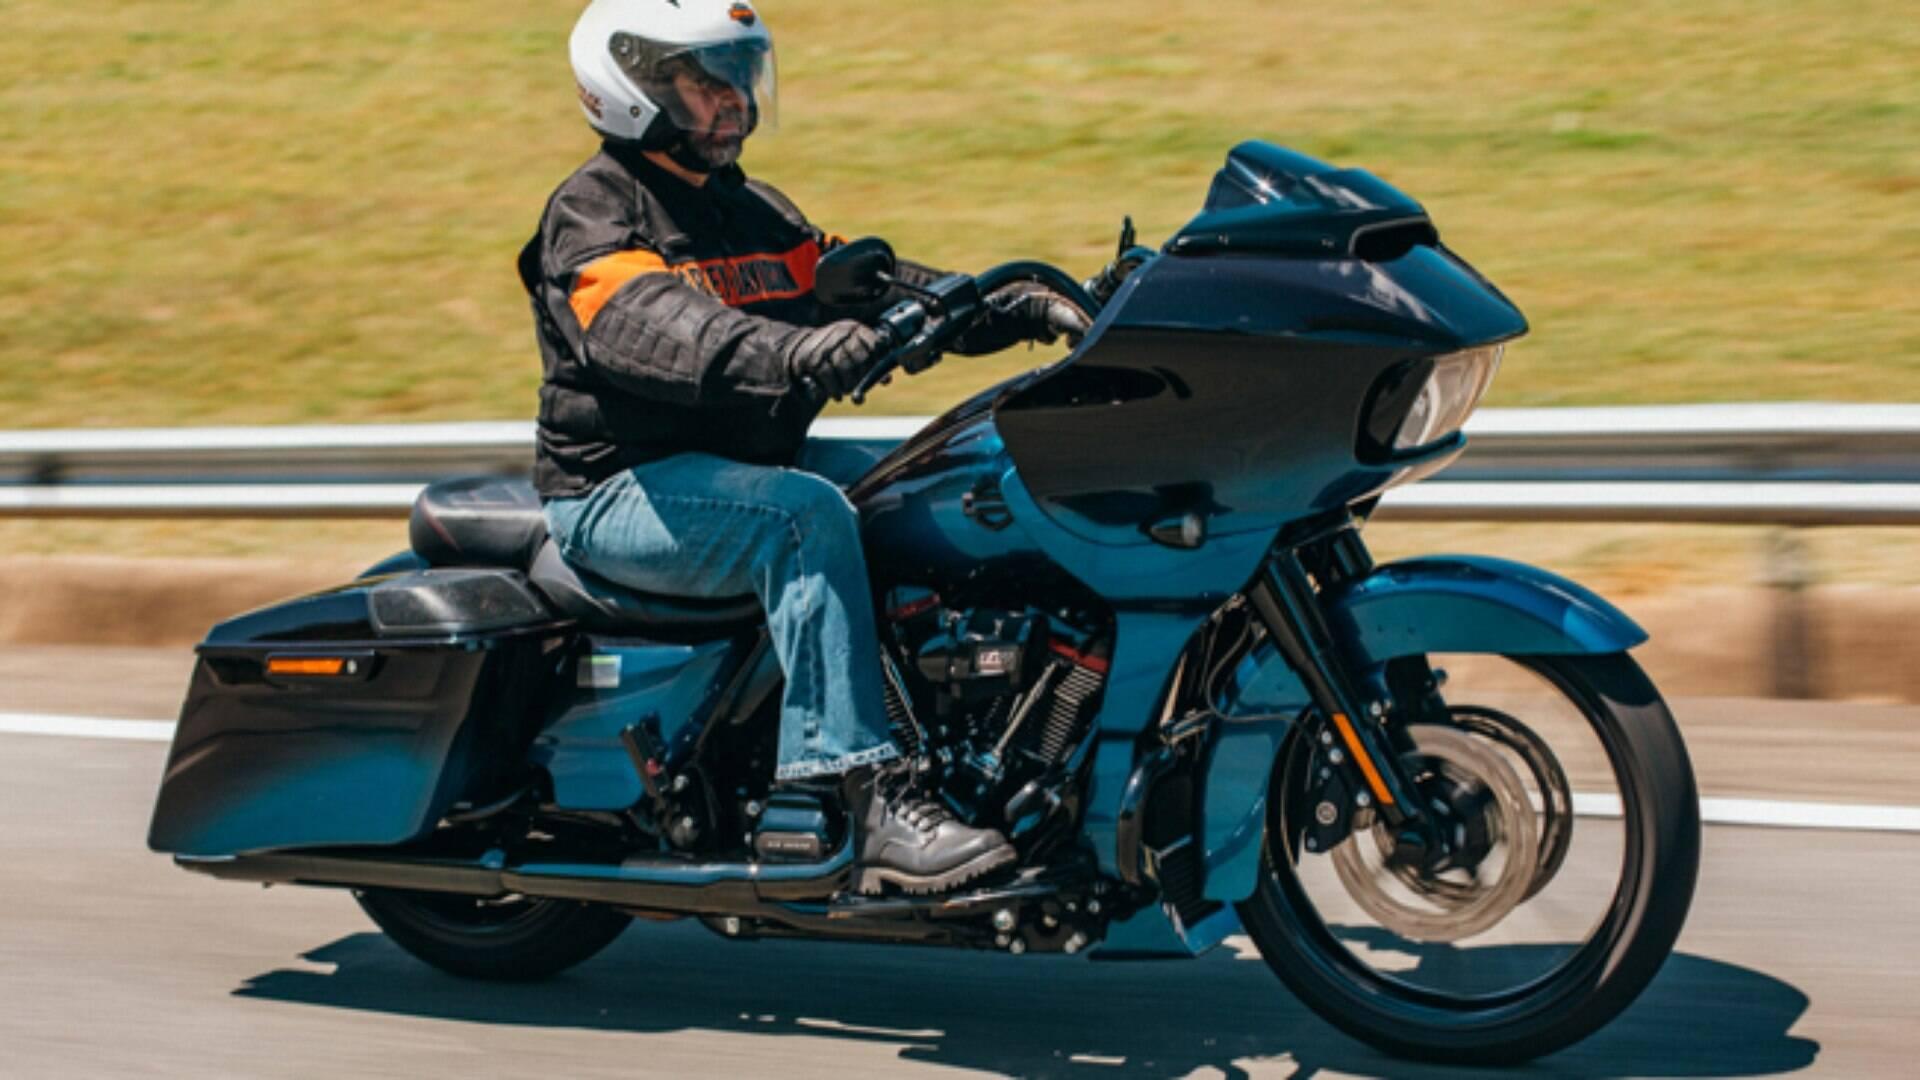 Harley Davidson Cvo Road Glide Cultura Da Motocicleta Ig